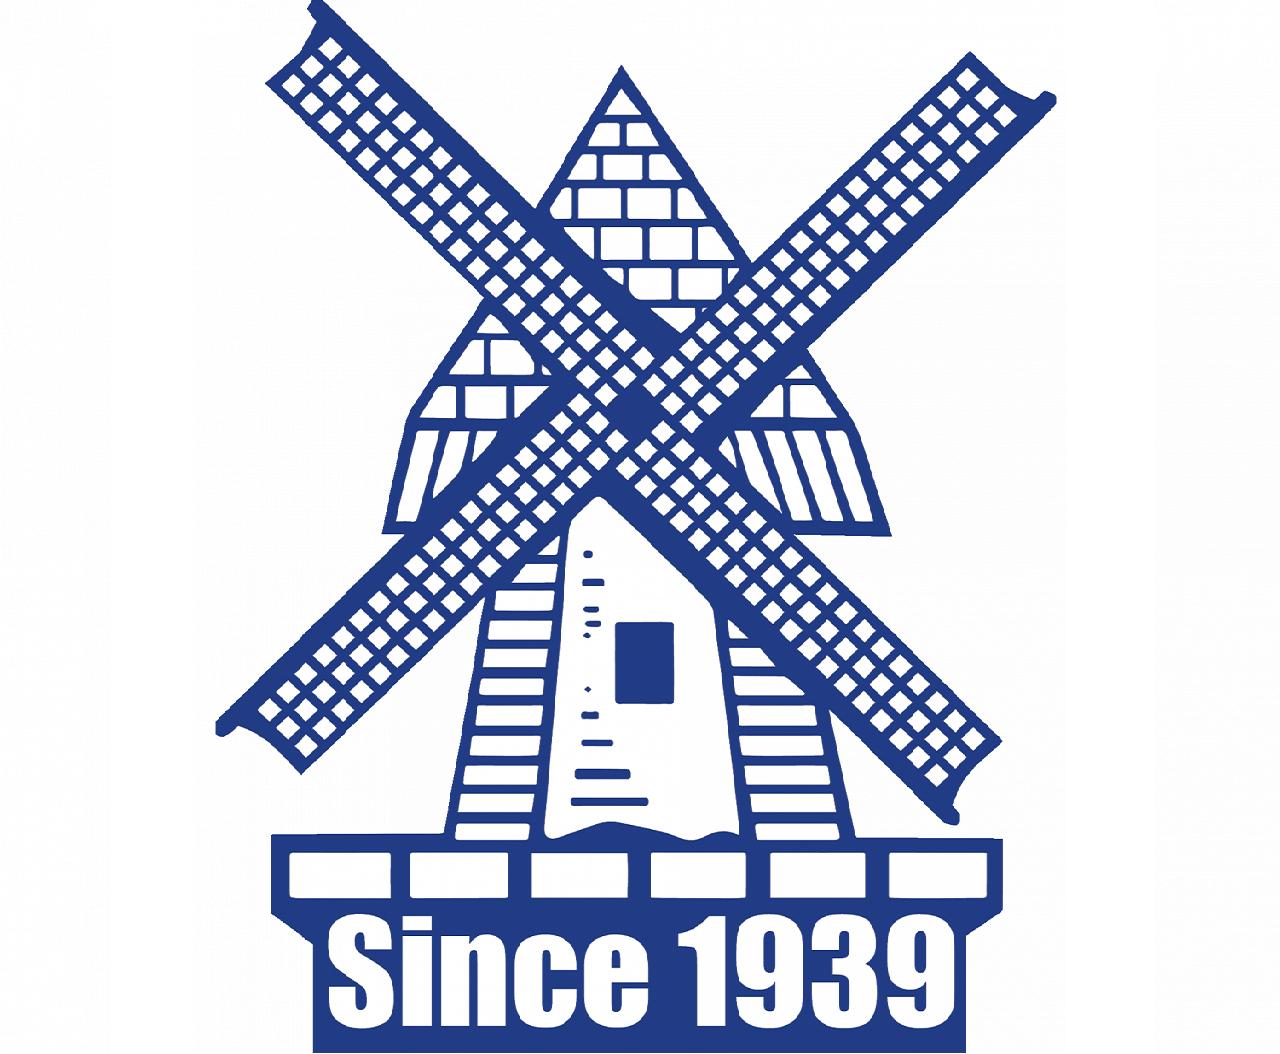 hino 268 price 745 00 [ 1280 x 956 Pixel ]